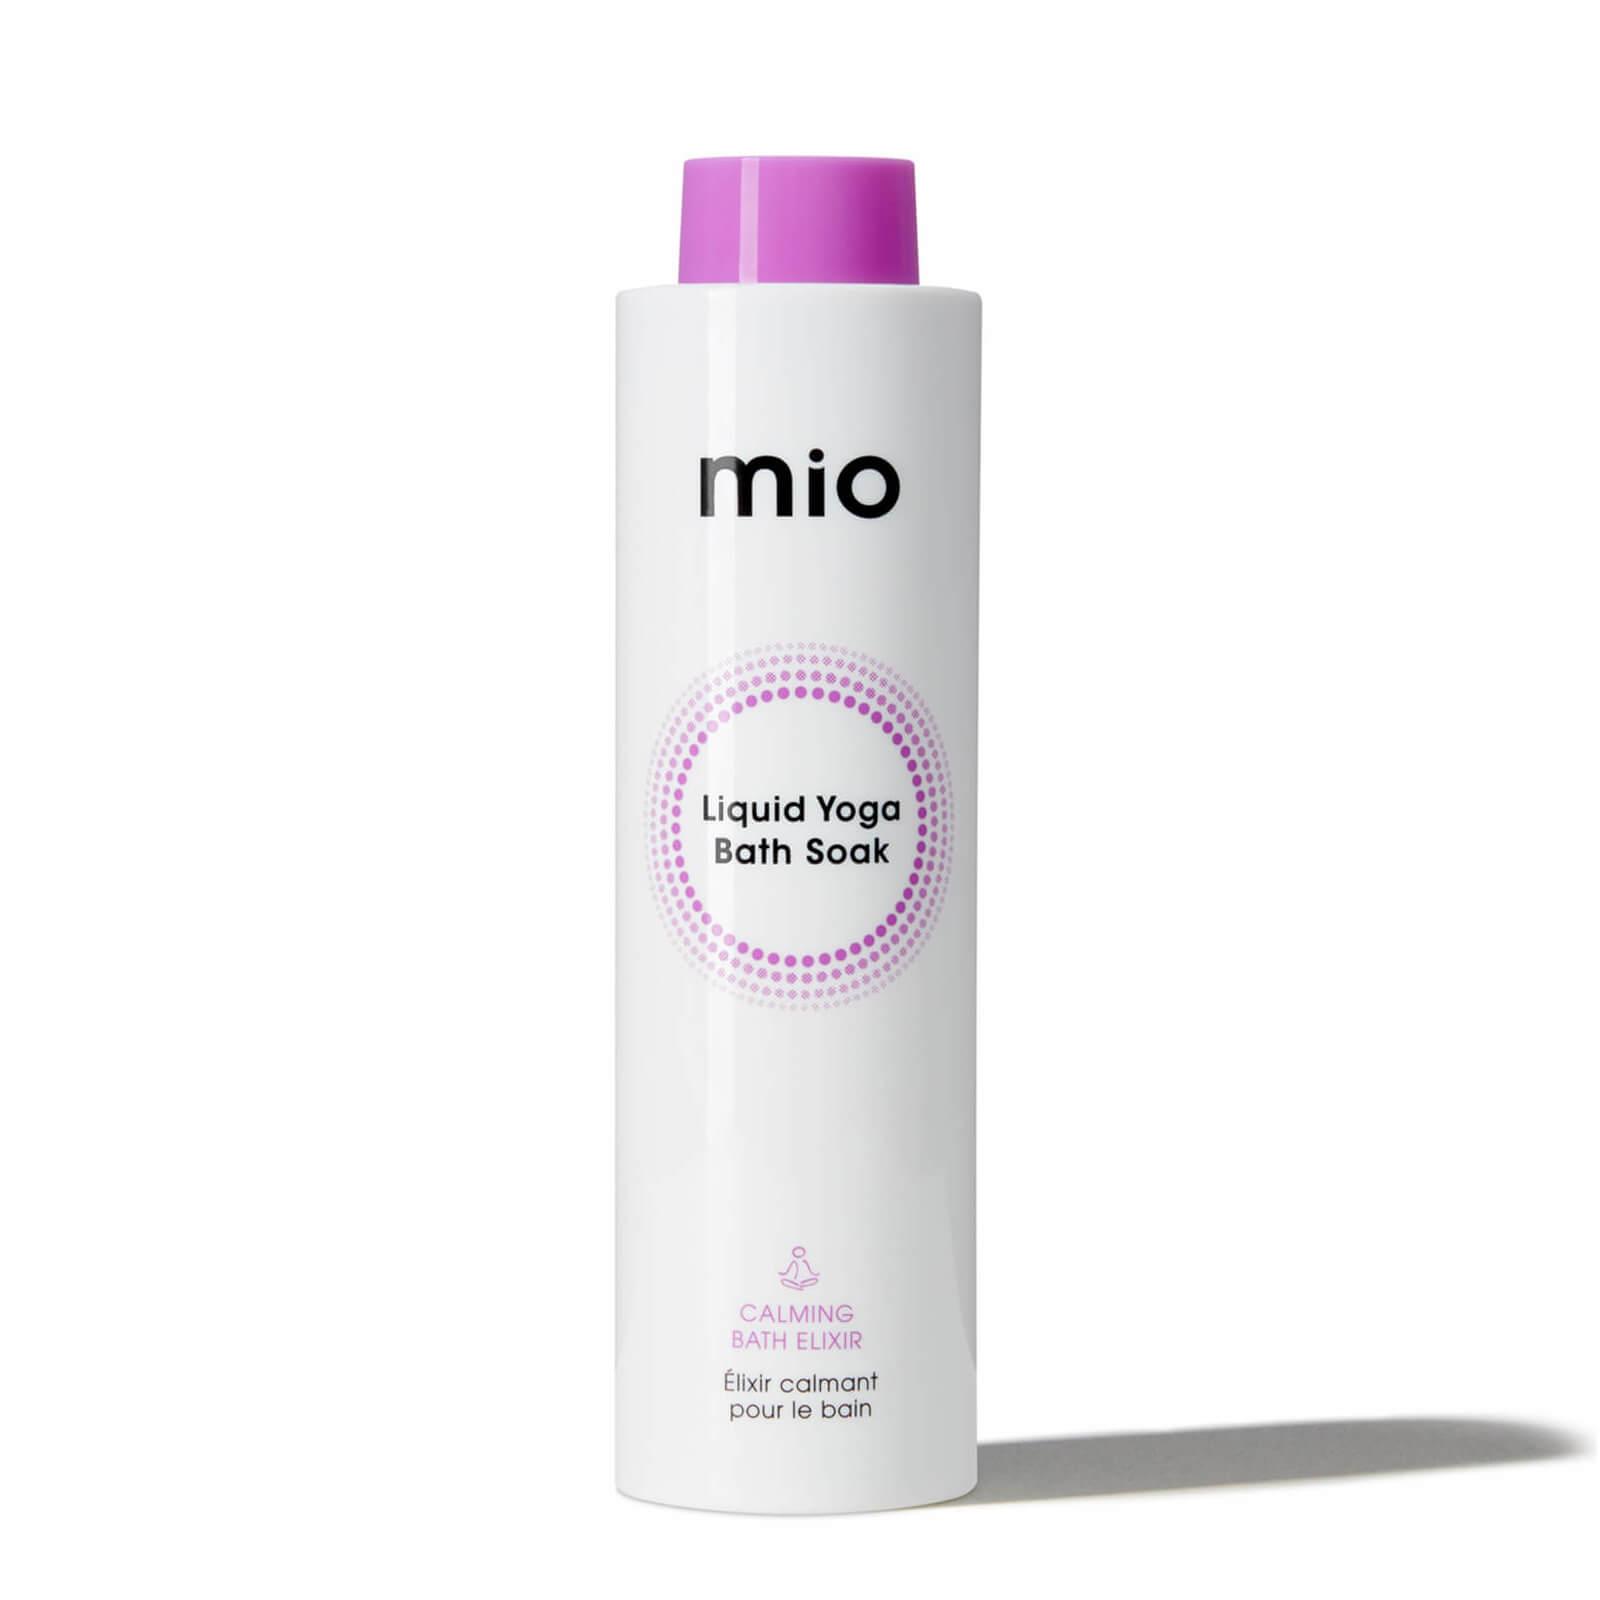 Mio Liquid Yoga Bath Soak 200ml